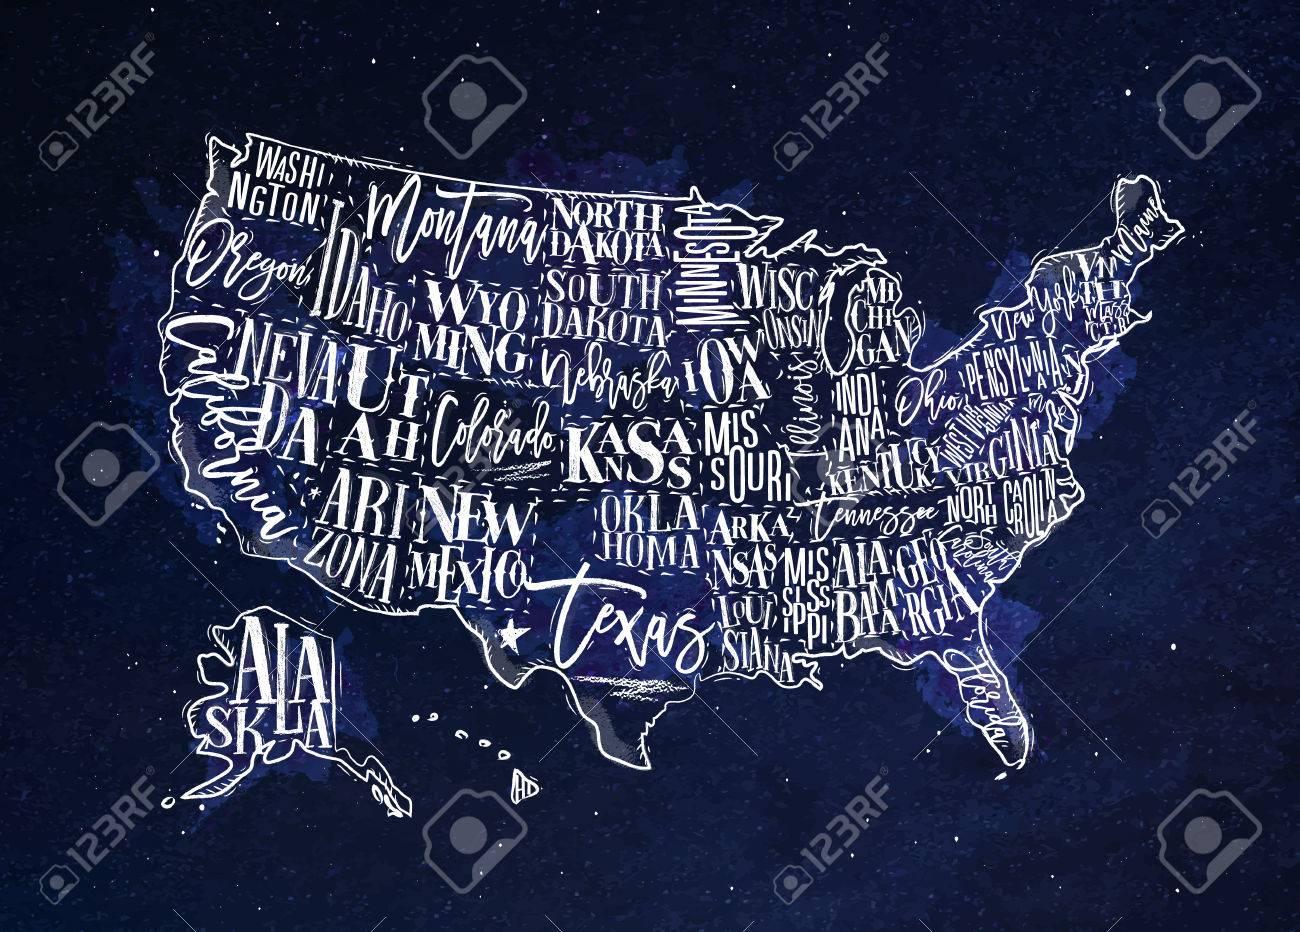 Map Of Nevada And Arizona Usa.Vintage Usa Map With States Inscription California Florida